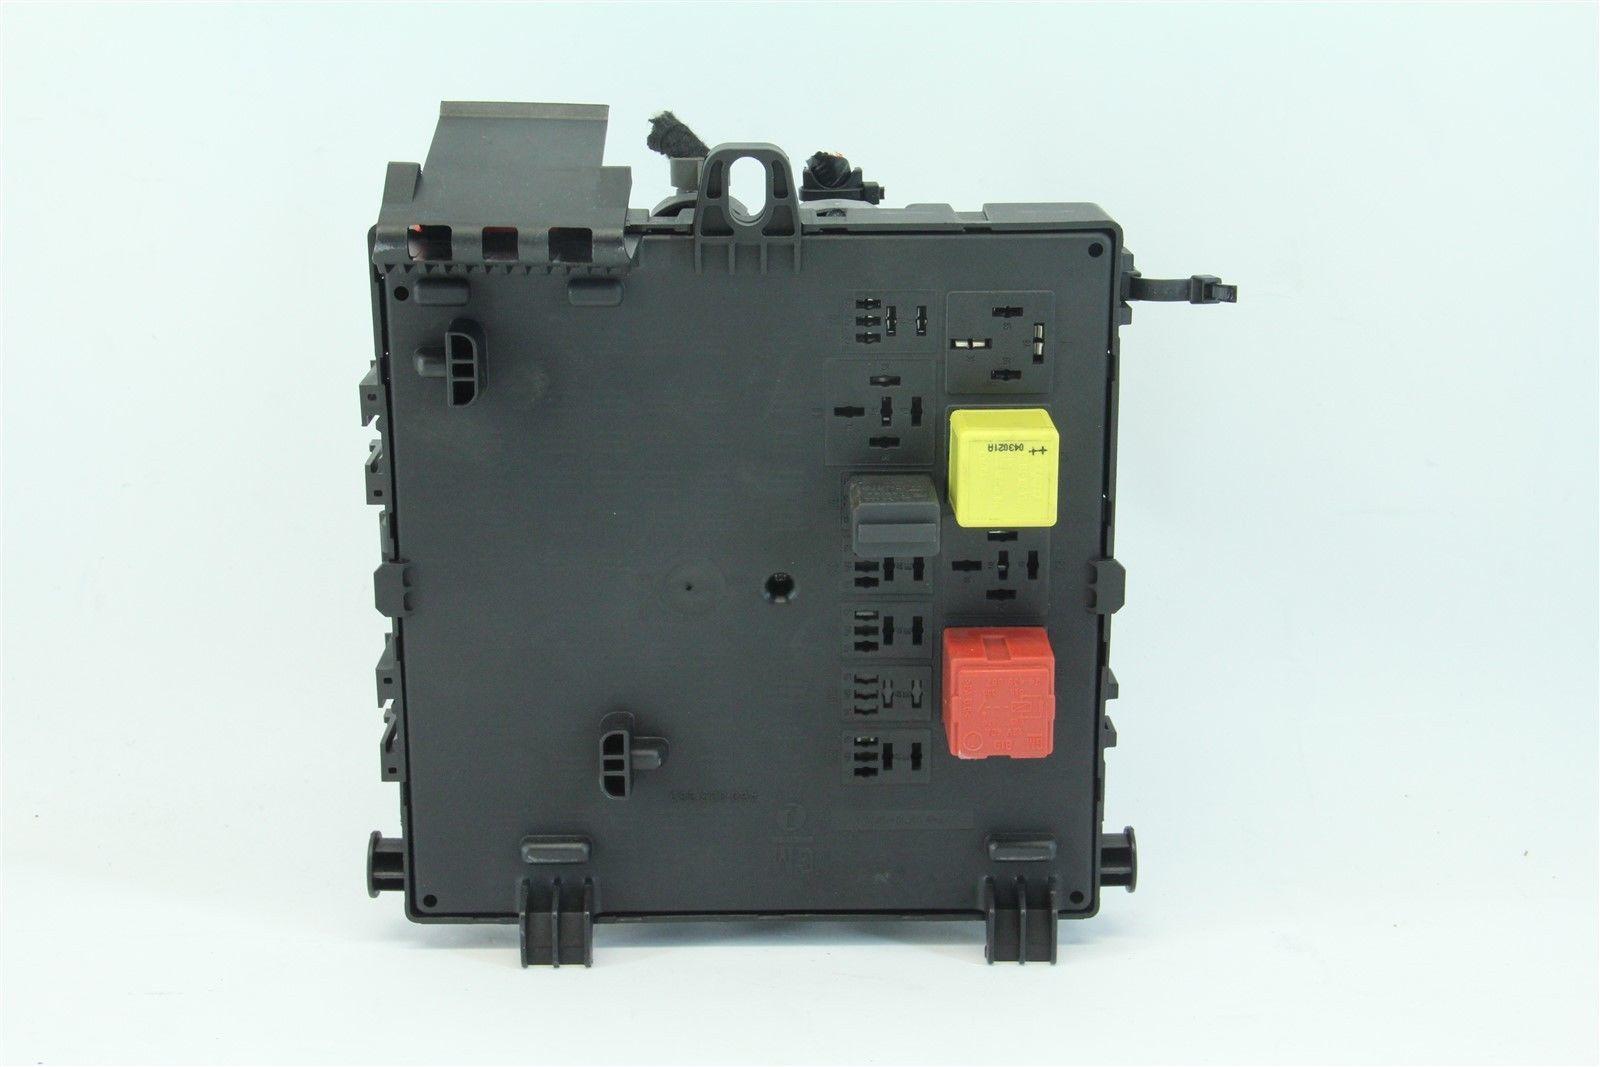 hight resolution of saab 9 3 interior rear fuse box 12805847 03 04 05 06 07